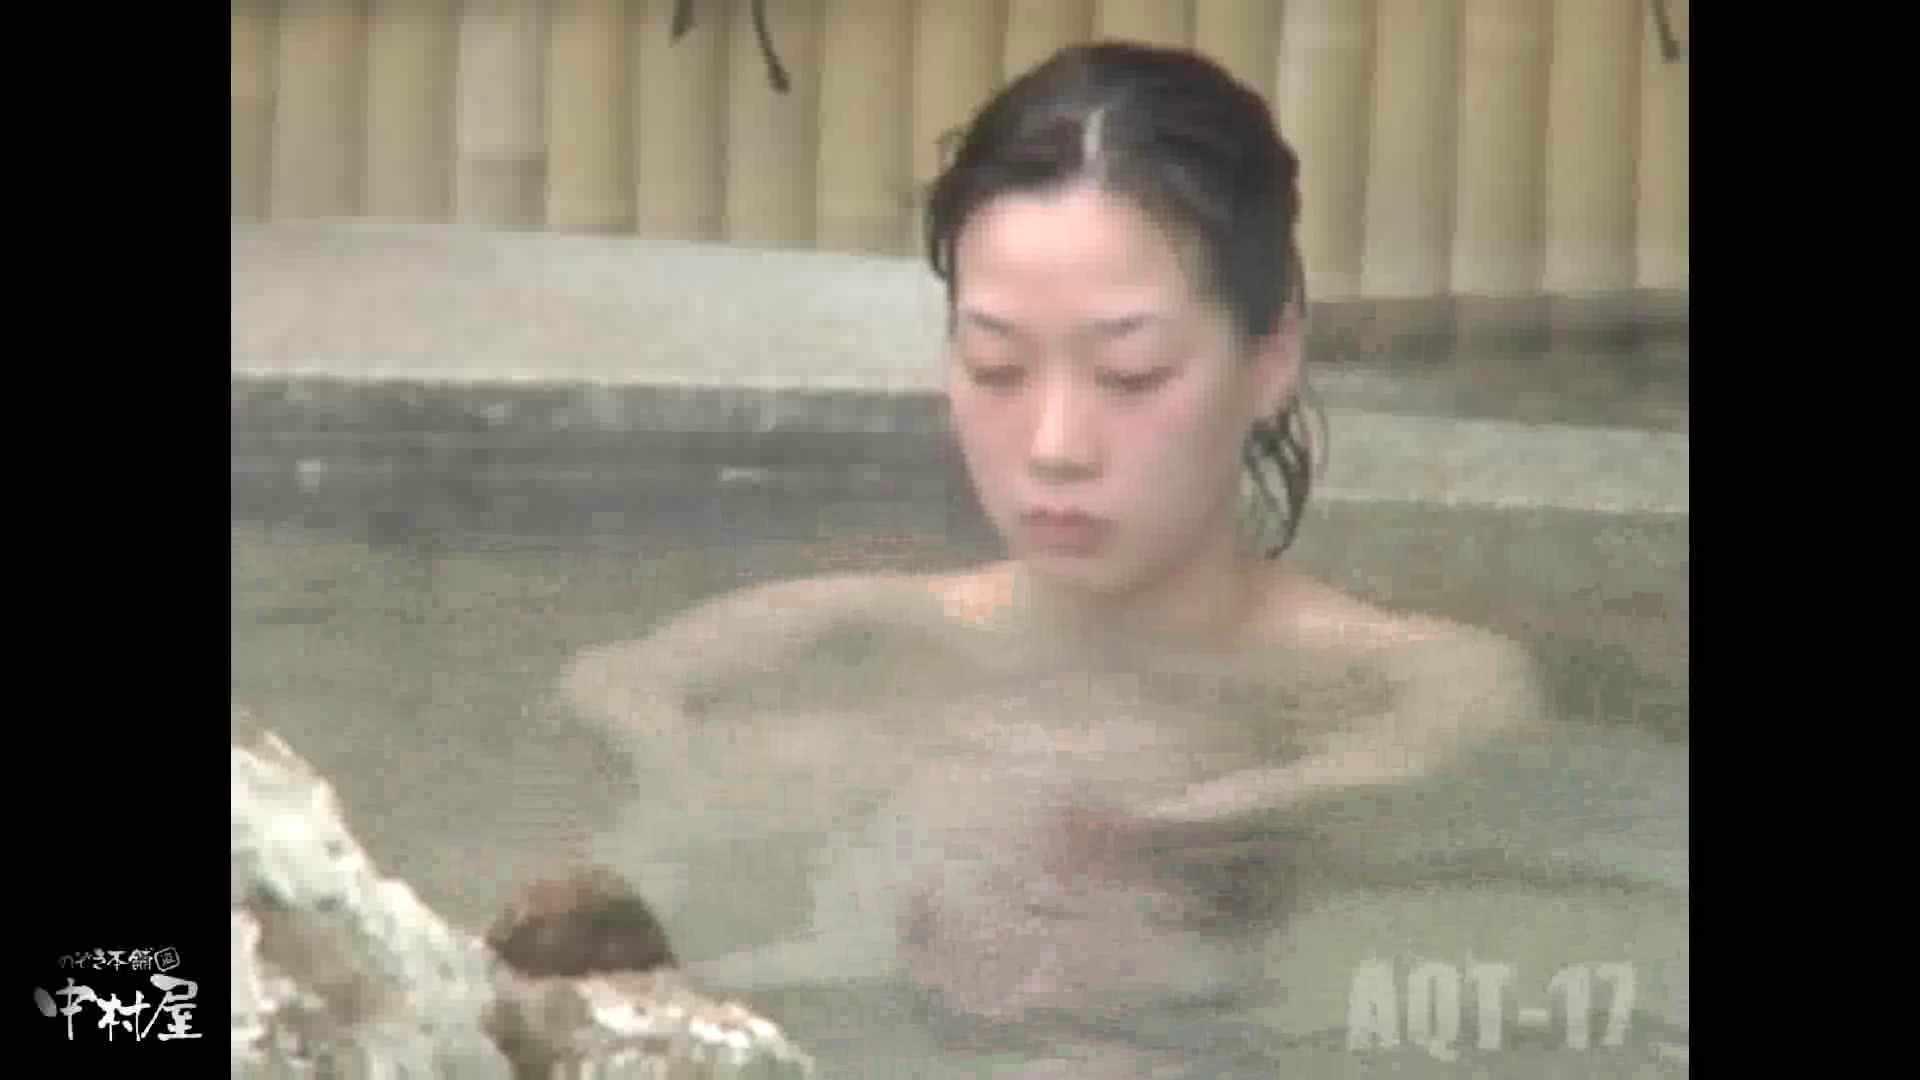 Aquaな露天風呂Vol.881潜入盗撮露天風呂十七判湯 其の一 盗撮特集   露天  68画像 26